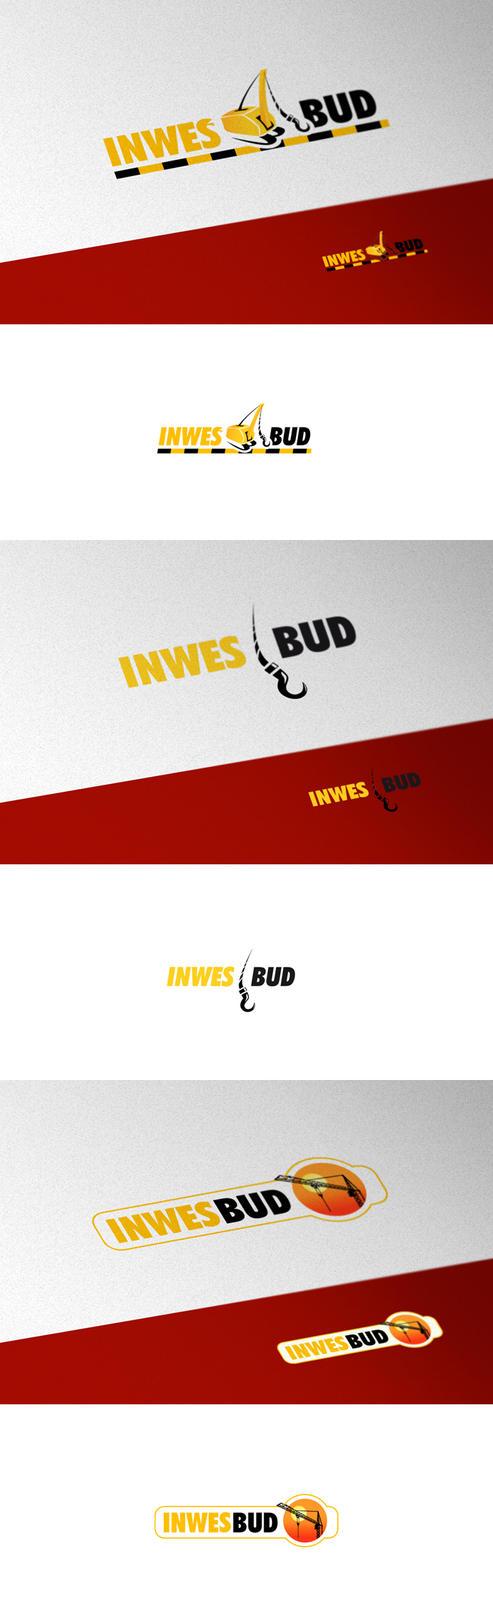 Inwesbud Logotype by pho3nix-bf